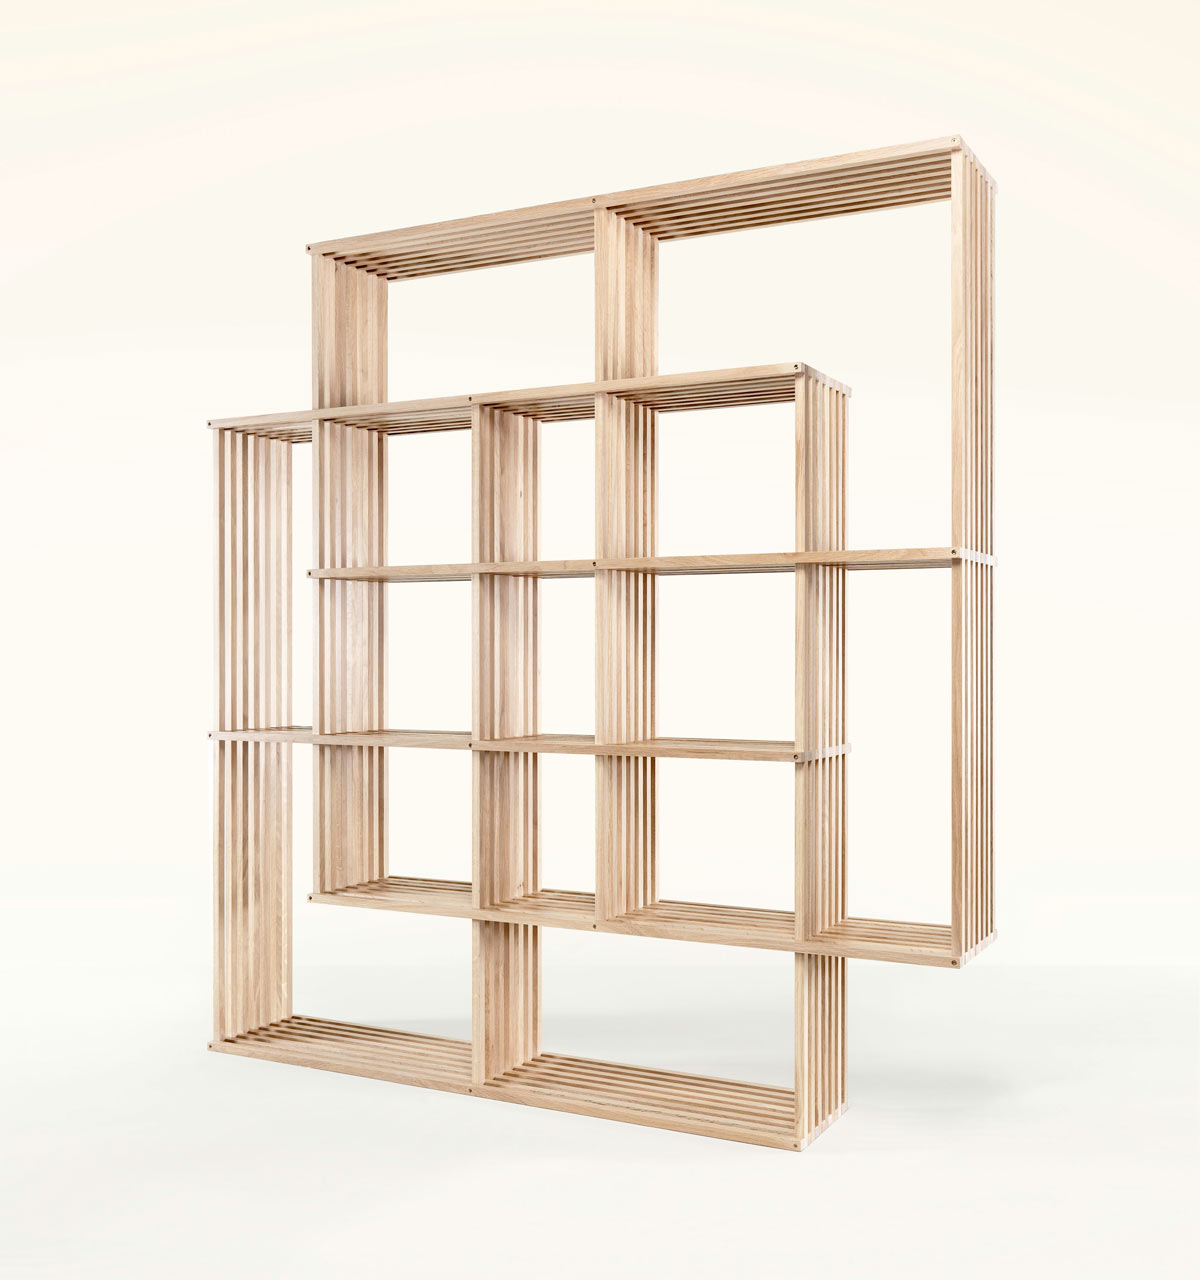 wewood-x2-bookshelf-marta-3